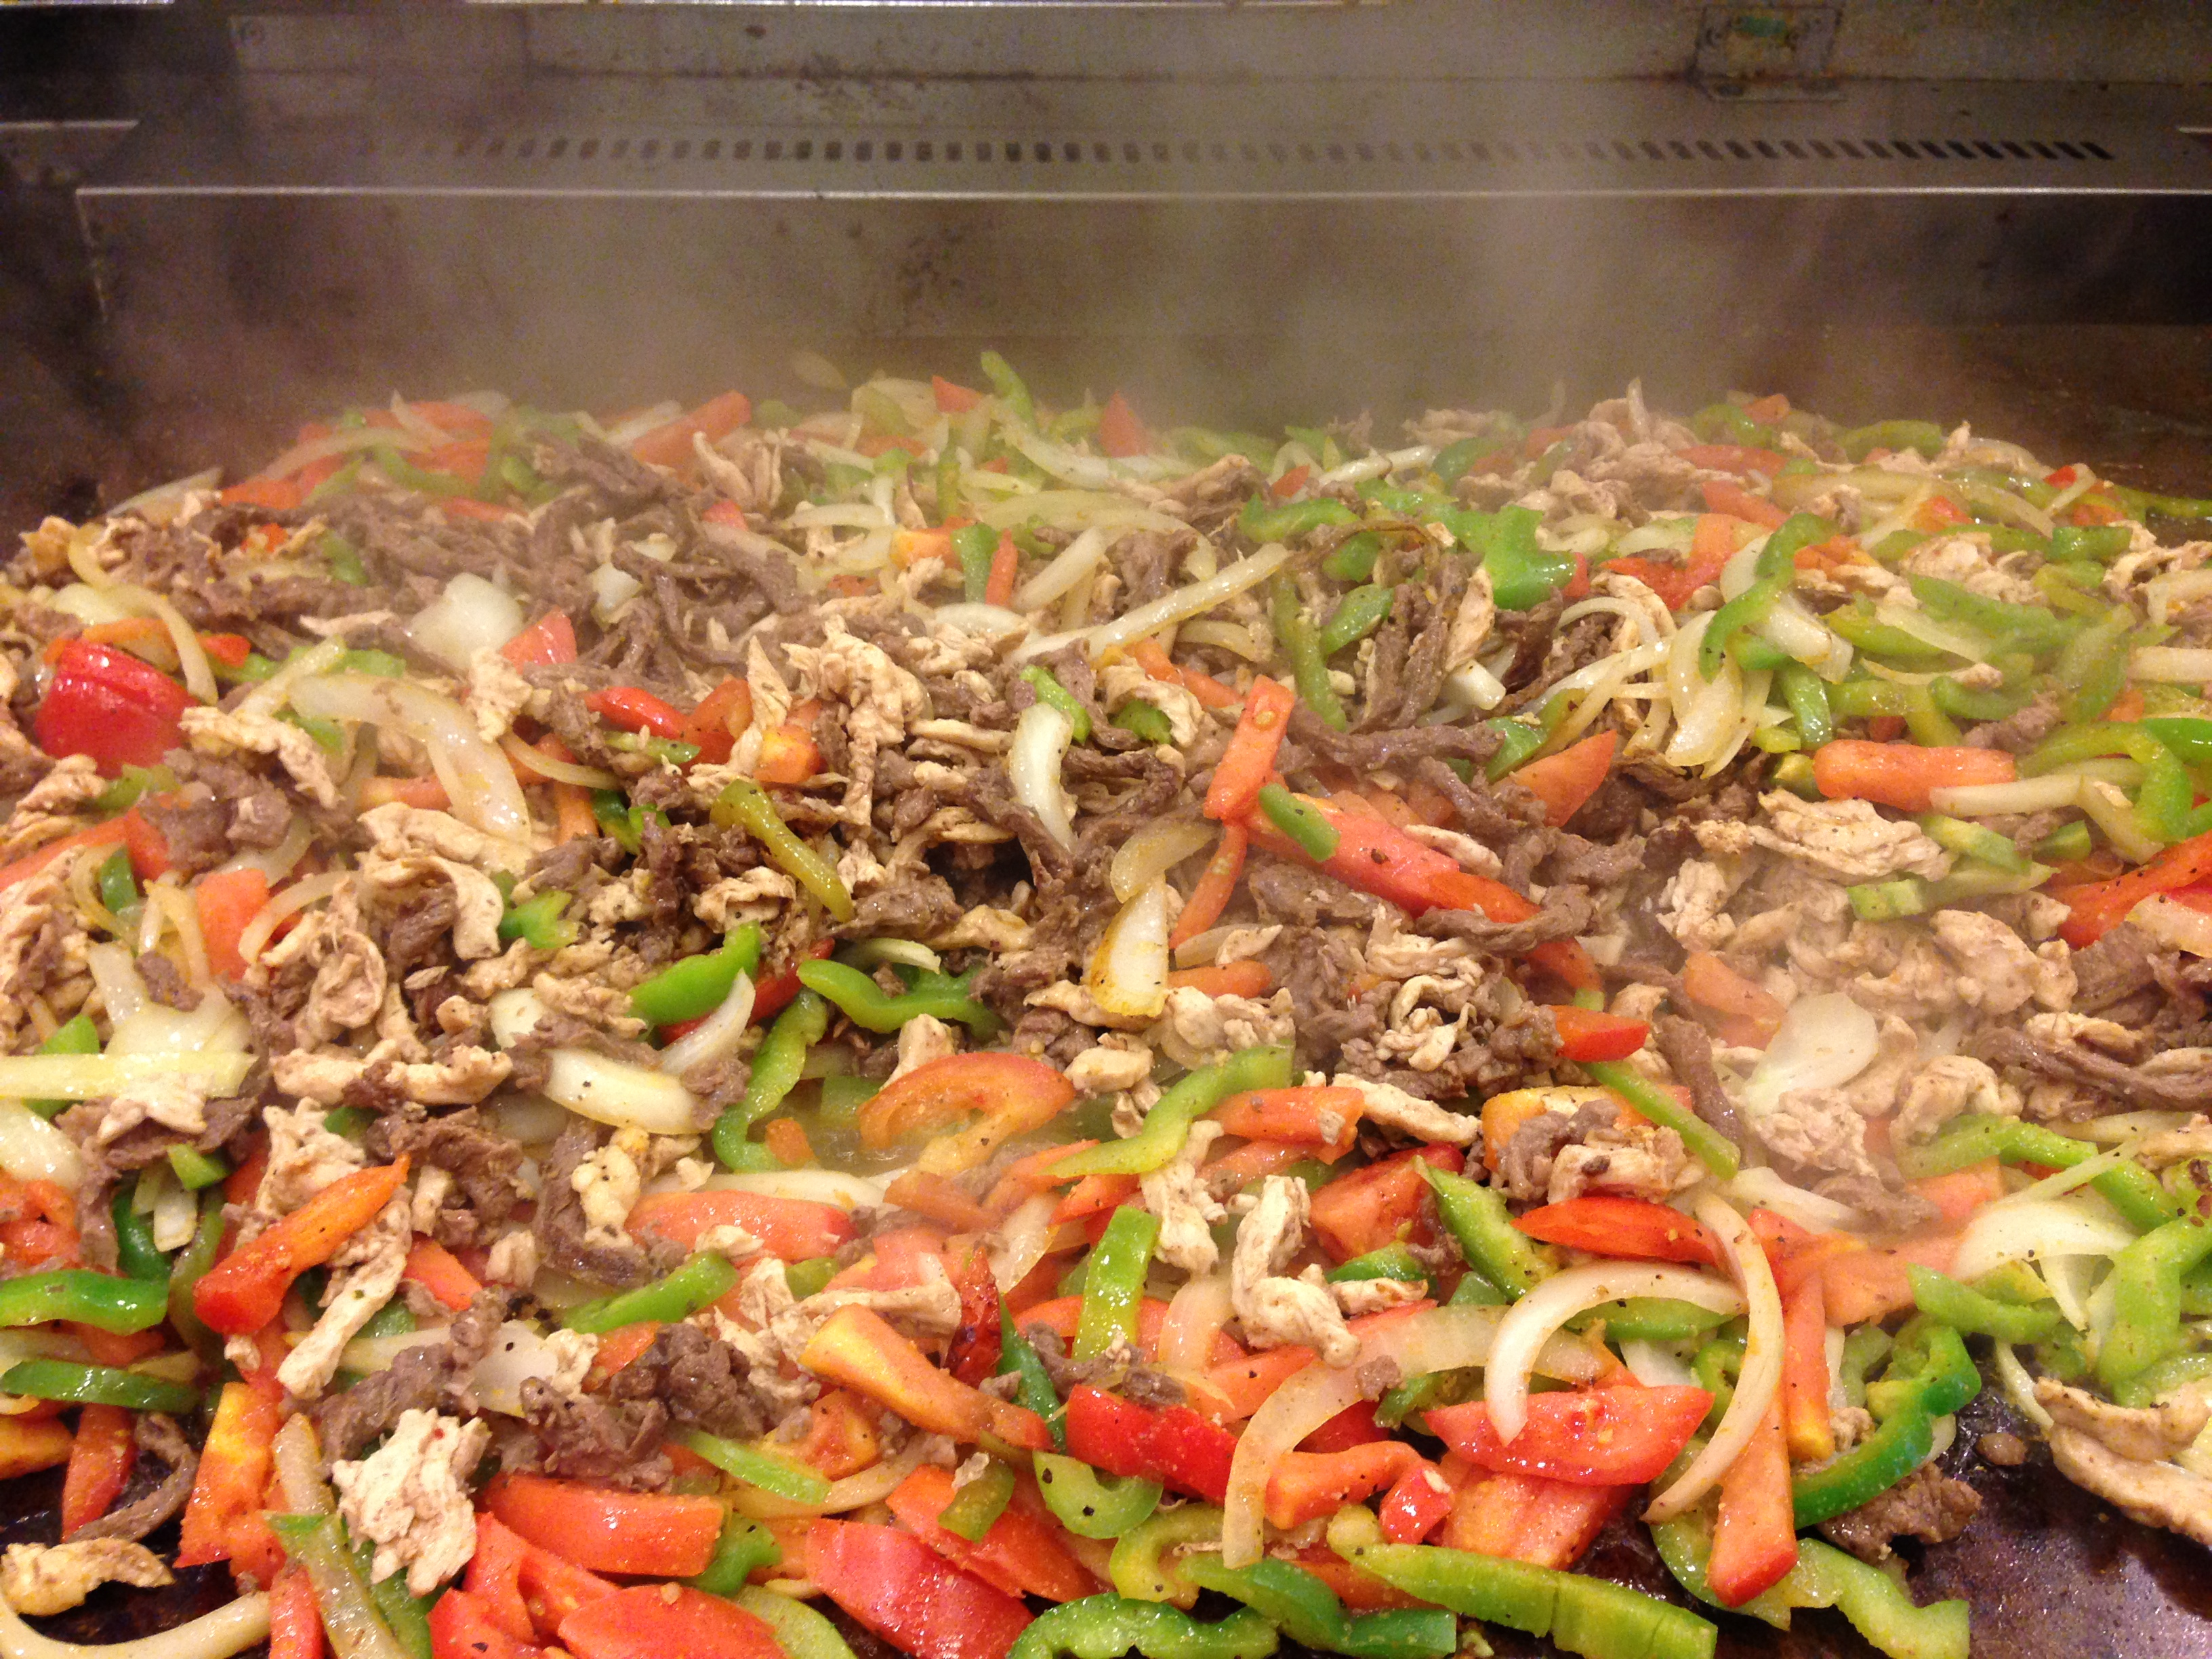 Fajitas Chicken Or Steak For 25 Image